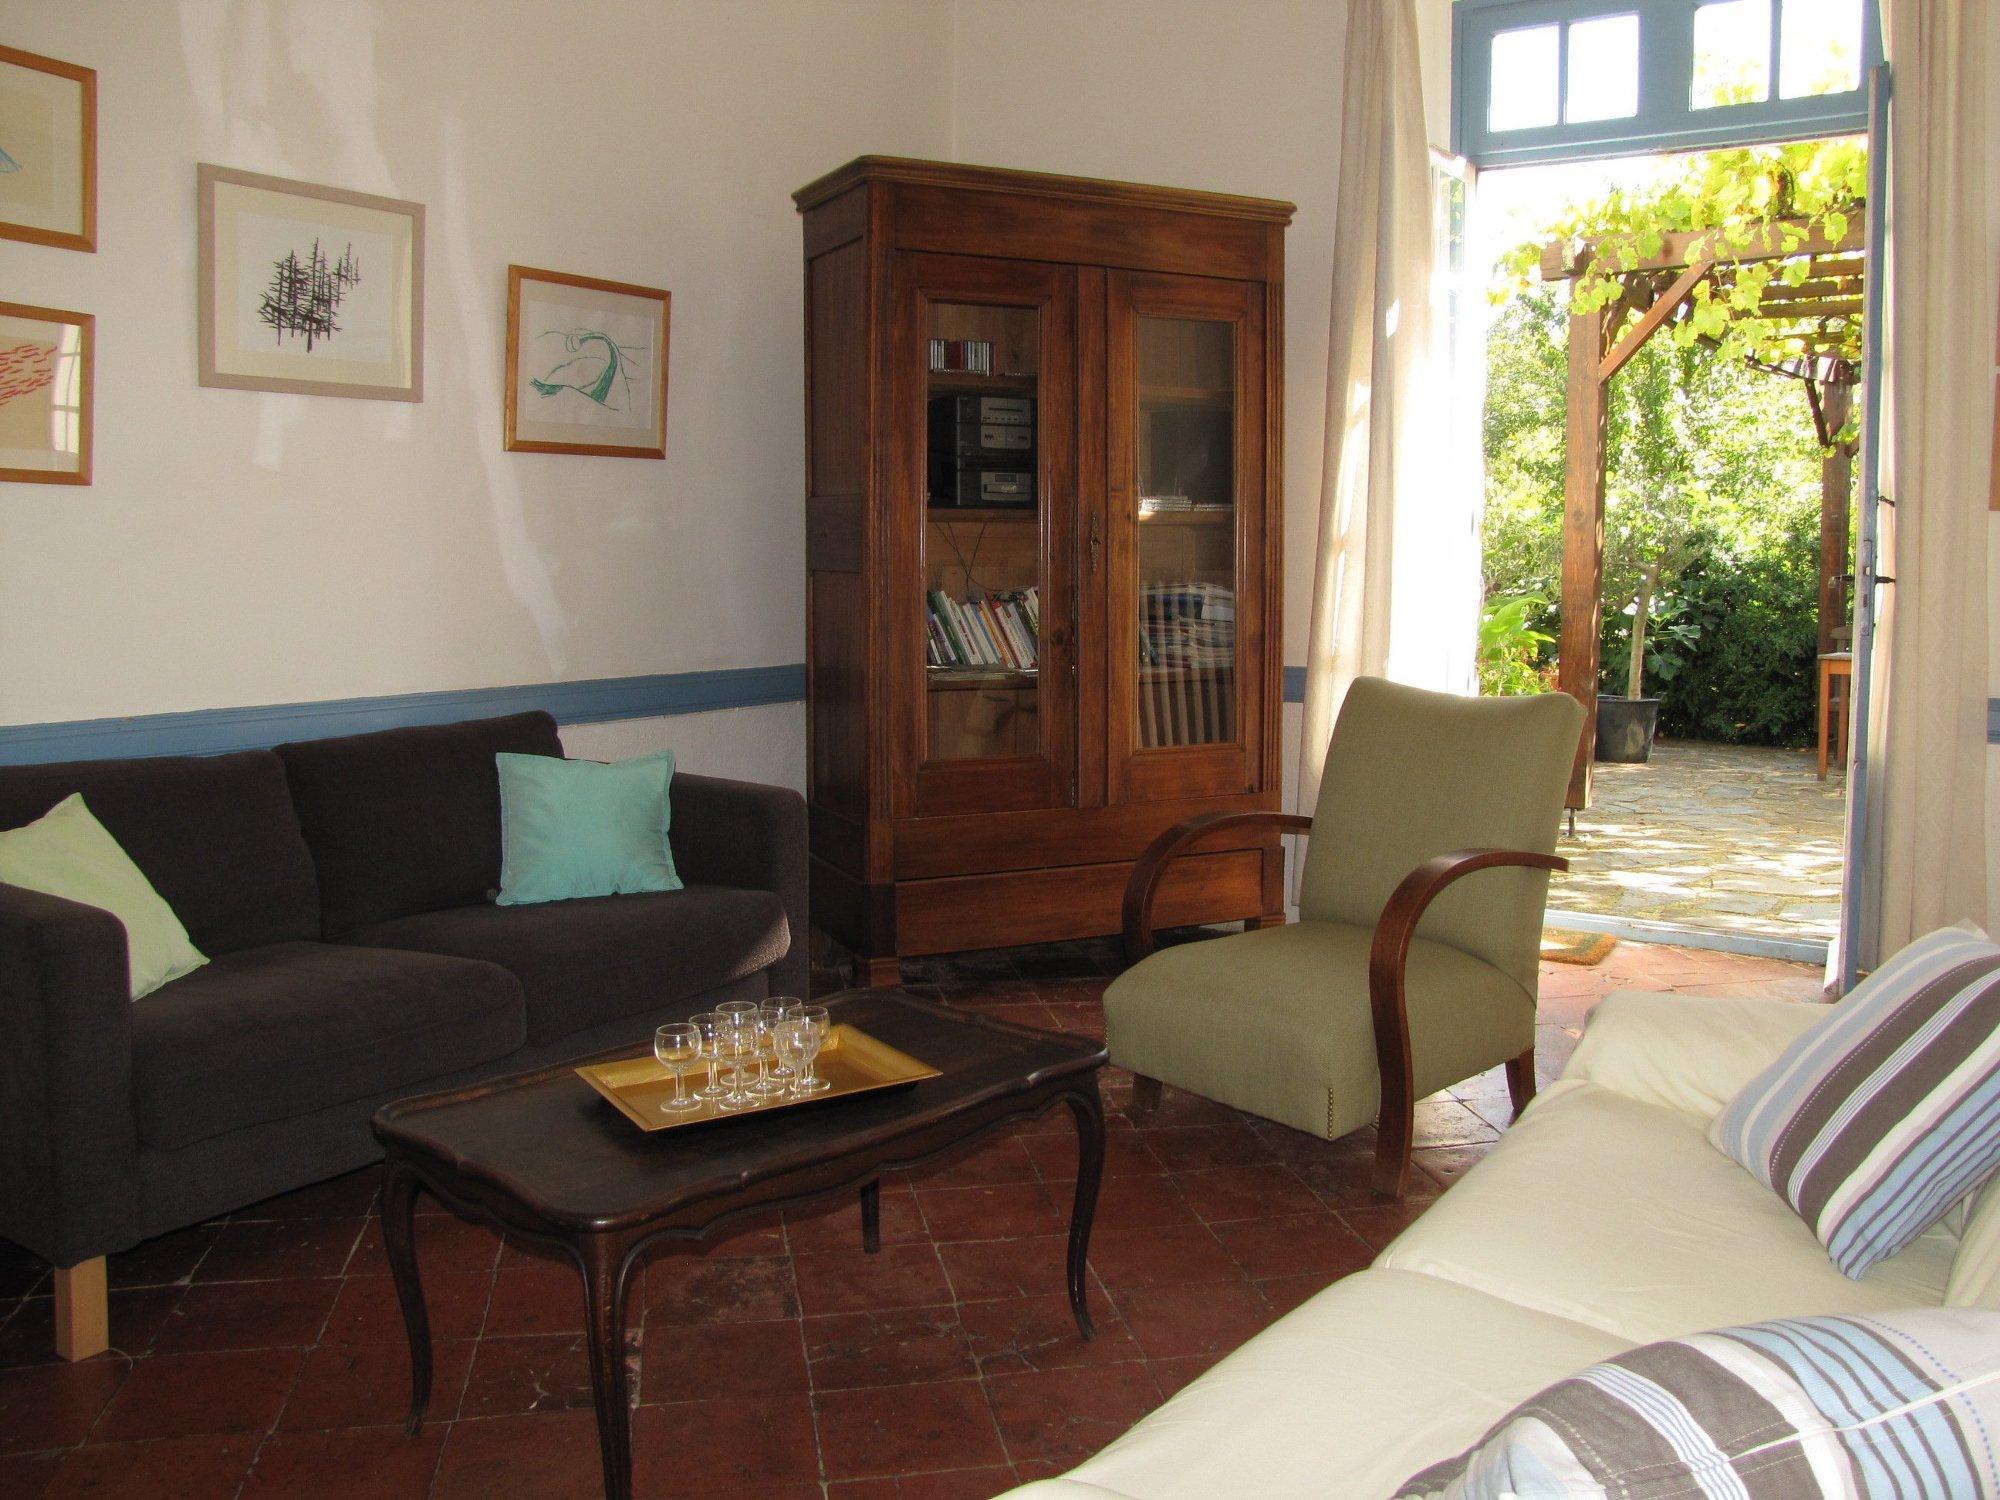 la giraudasse chambres d 39 h tes avec jardin en pays cathare soulatg aude la giraudasse. Black Bedroom Furniture Sets. Home Design Ideas